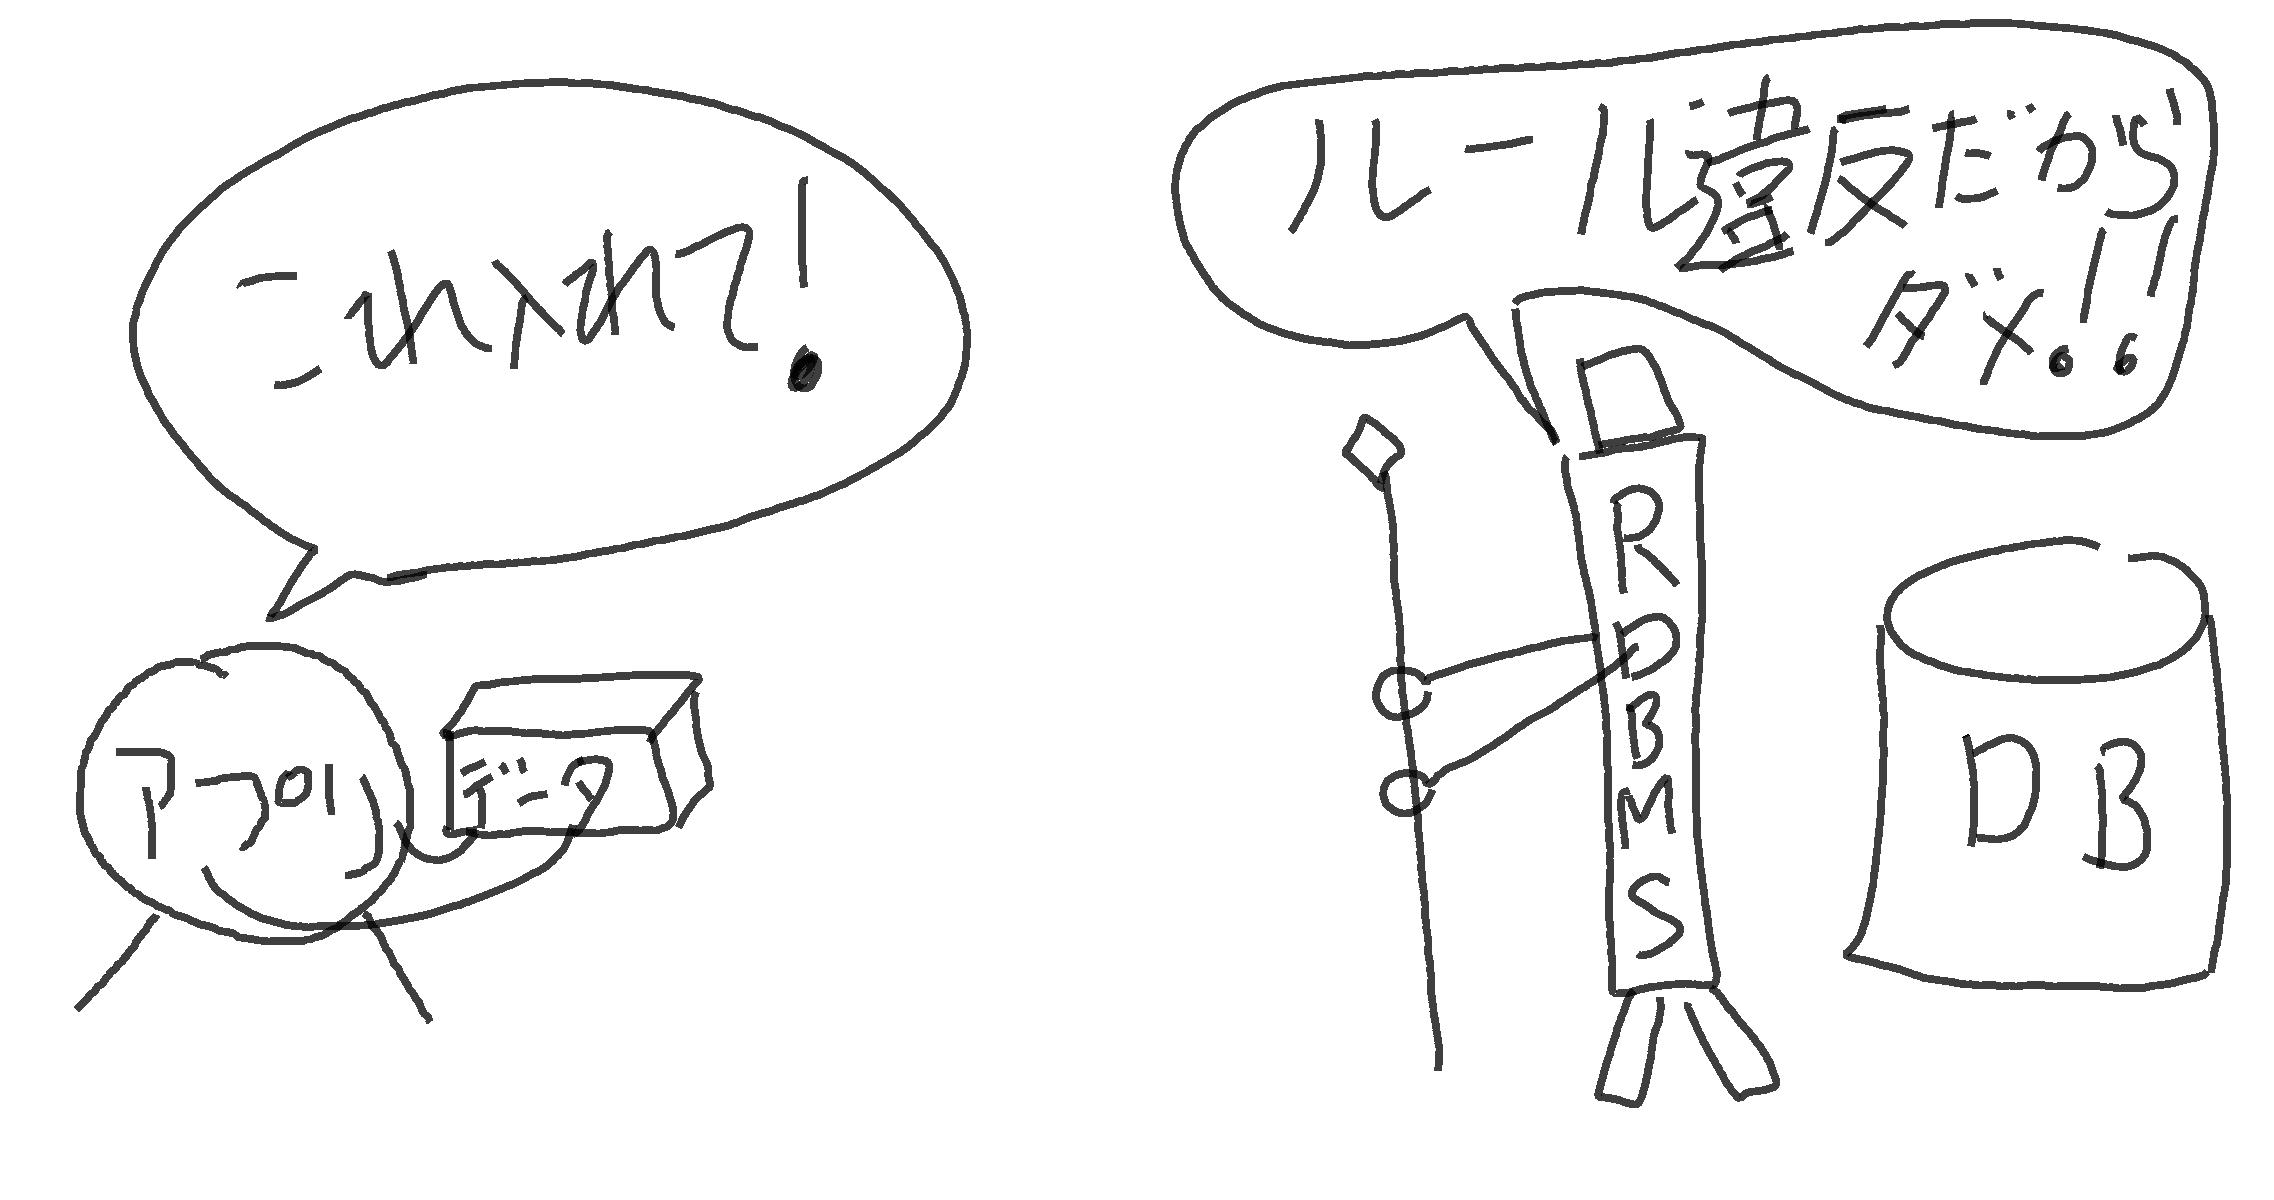 RDBMS.png